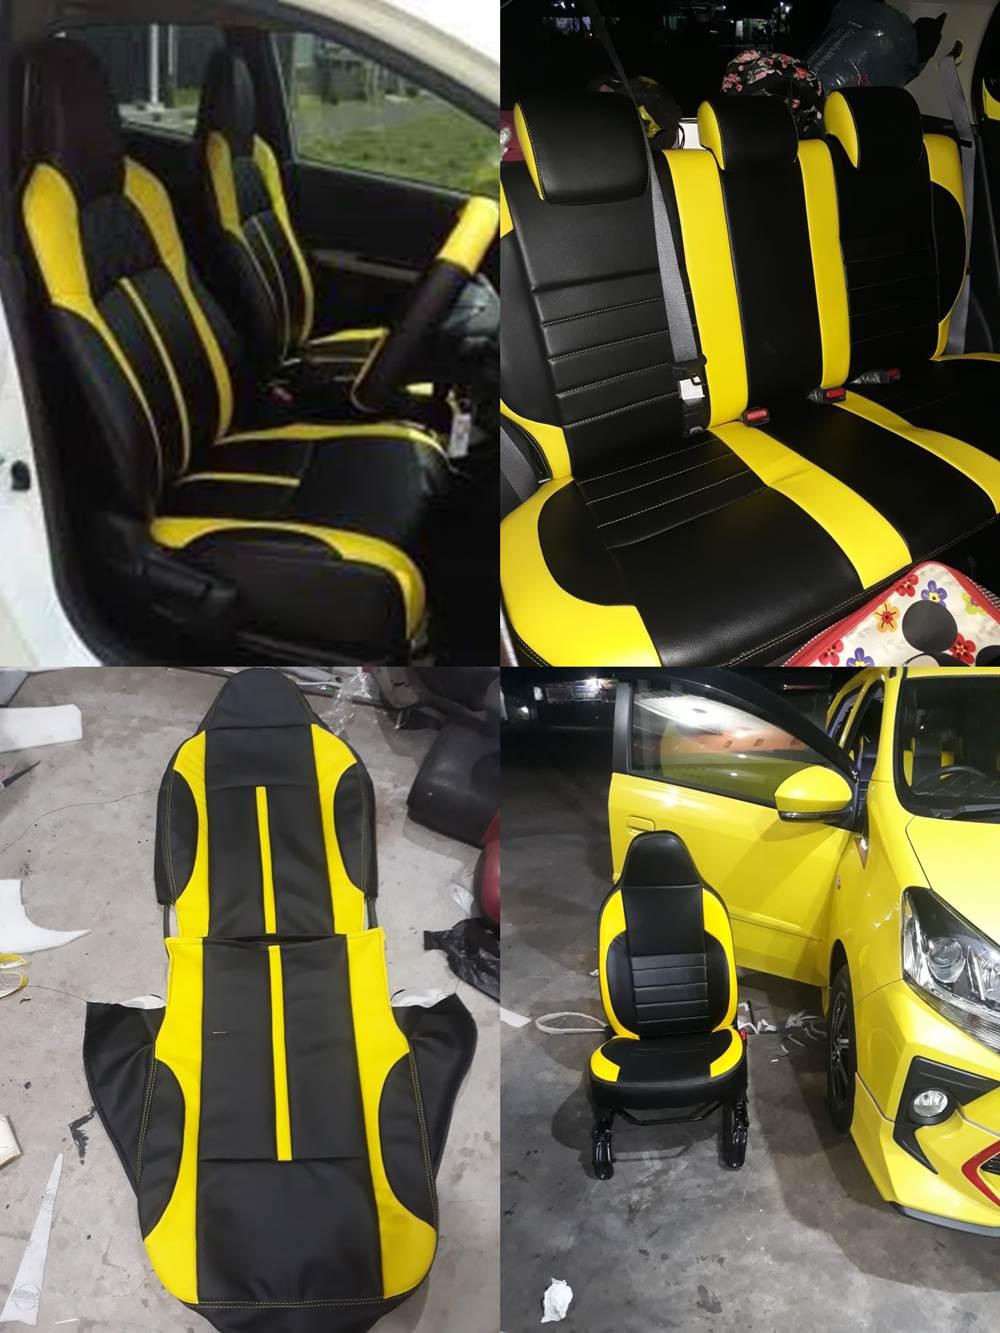 Inaya Motor 5 1 - Inaya Motor - Spesialis Car Interior Pekanbaru